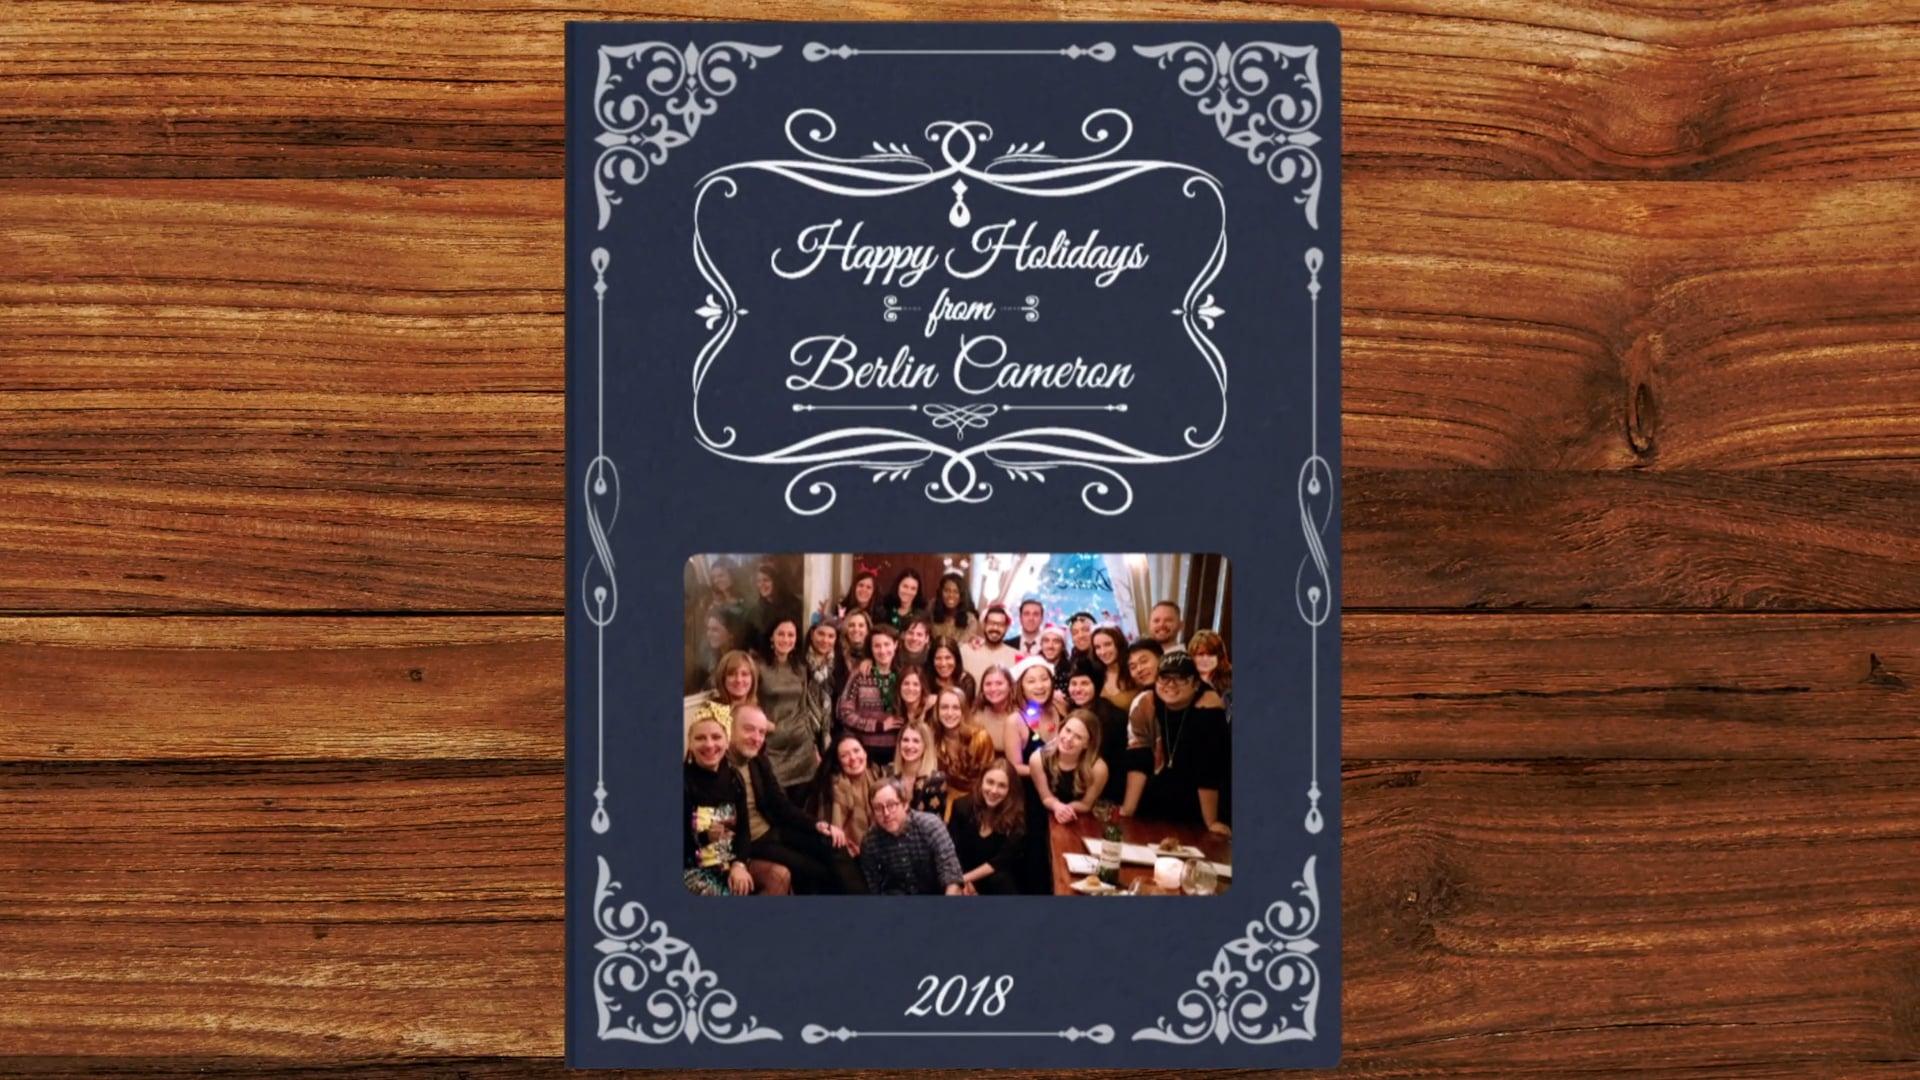 Berlin Cameron Holiday Card